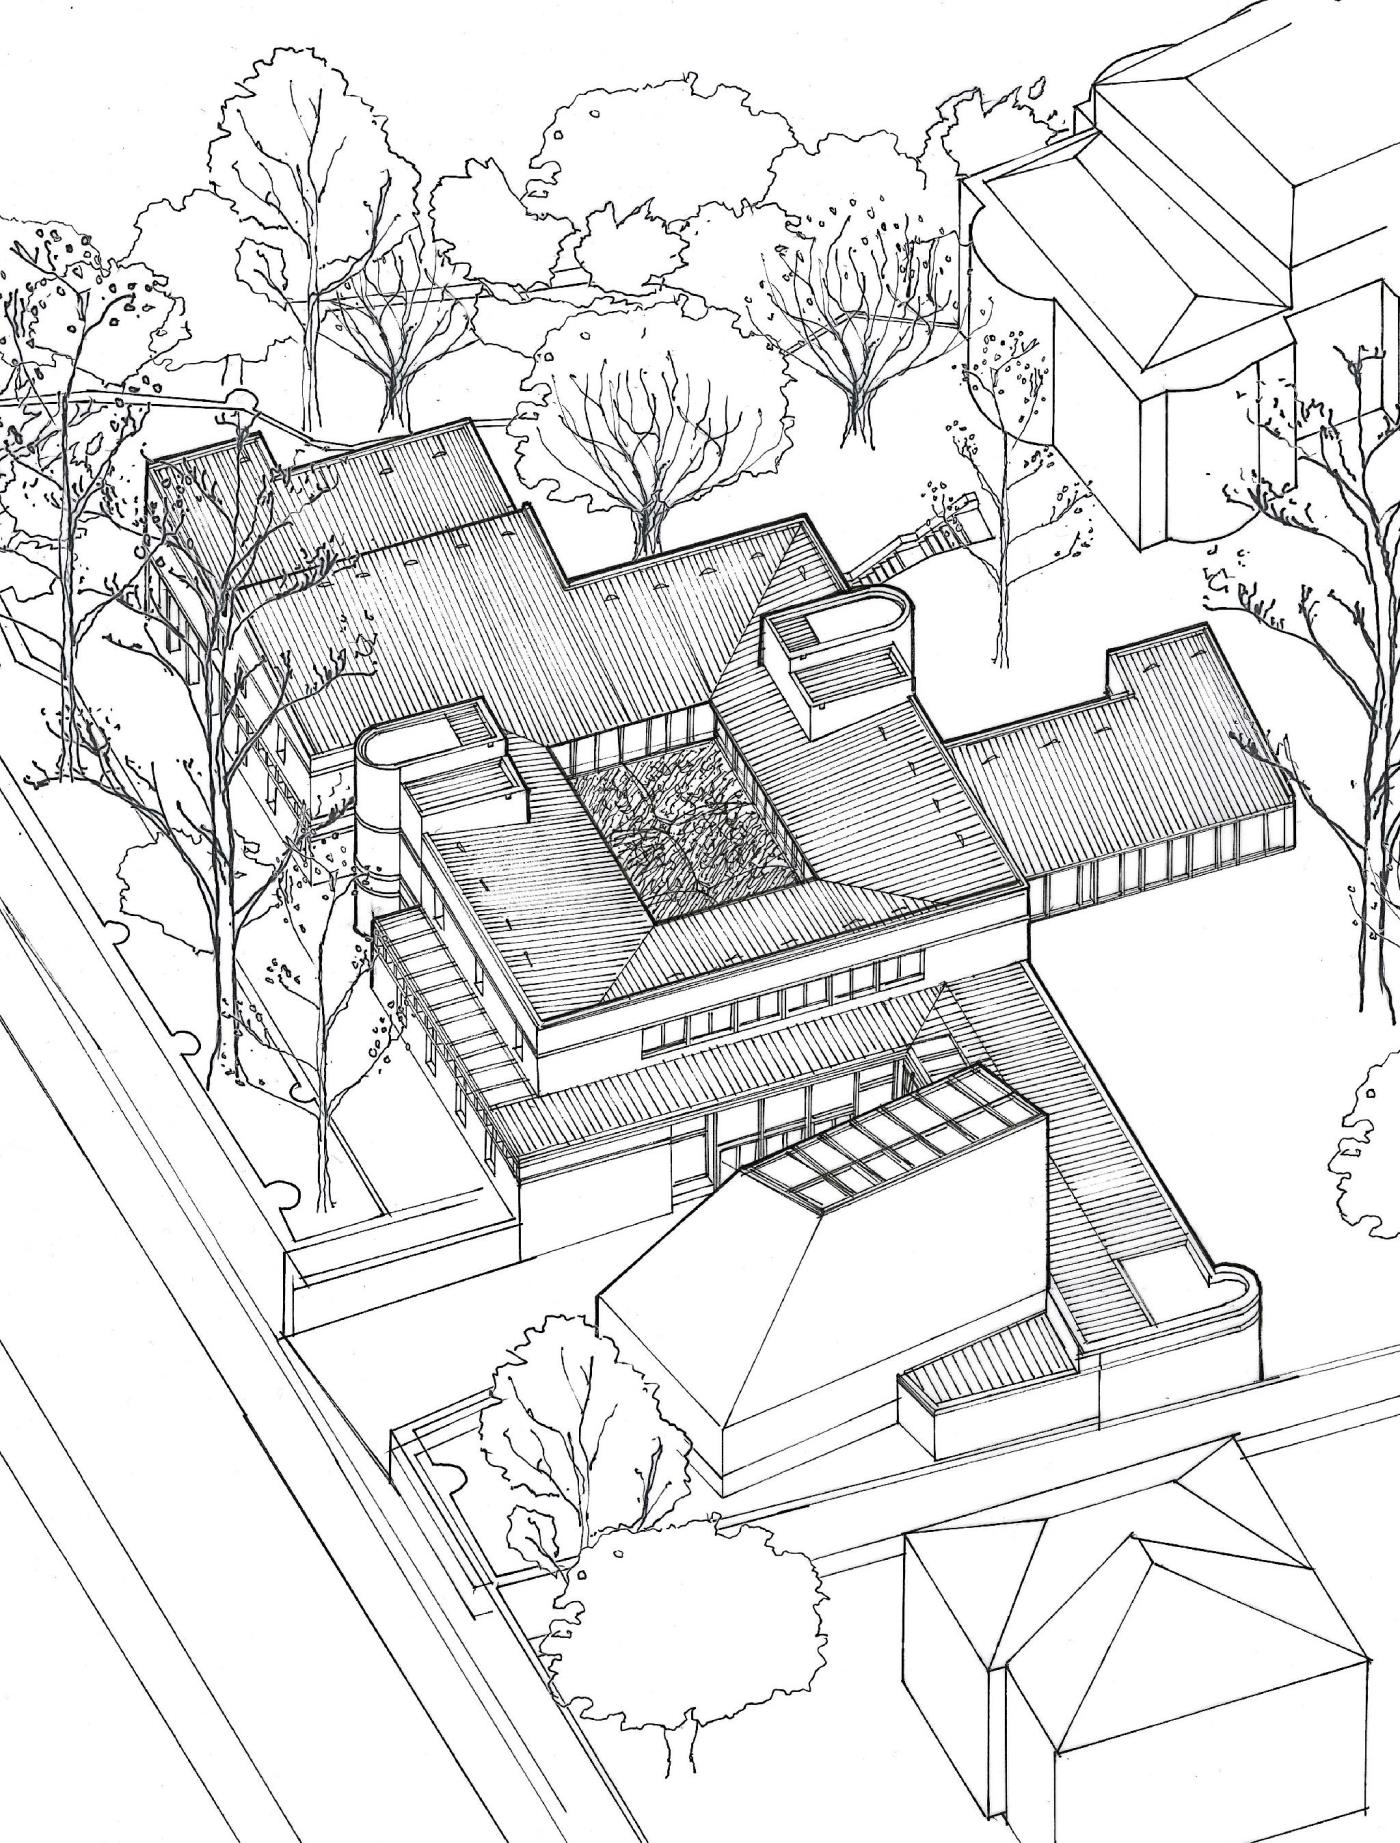 The Existential Bauhaus